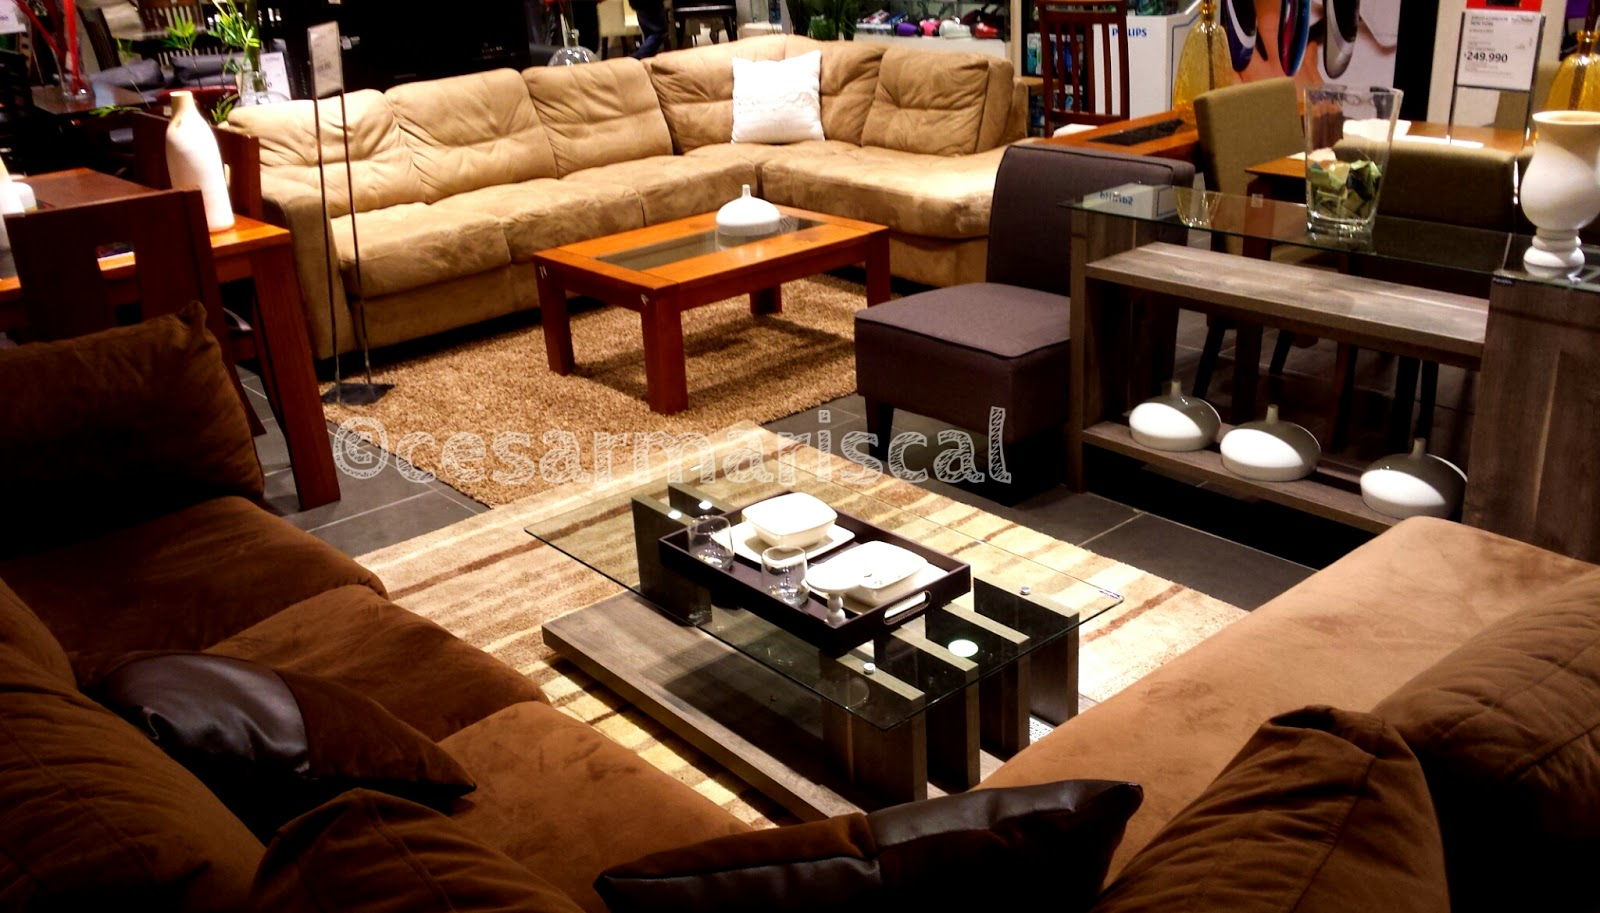 Muebles Ripley Concepcion - Chile Viajesk Agosto 2015[mjhdah]http://www.tangopop.cl/img/servicios/Corners/9-MARQUIS-Ripley-Crillon.jpg